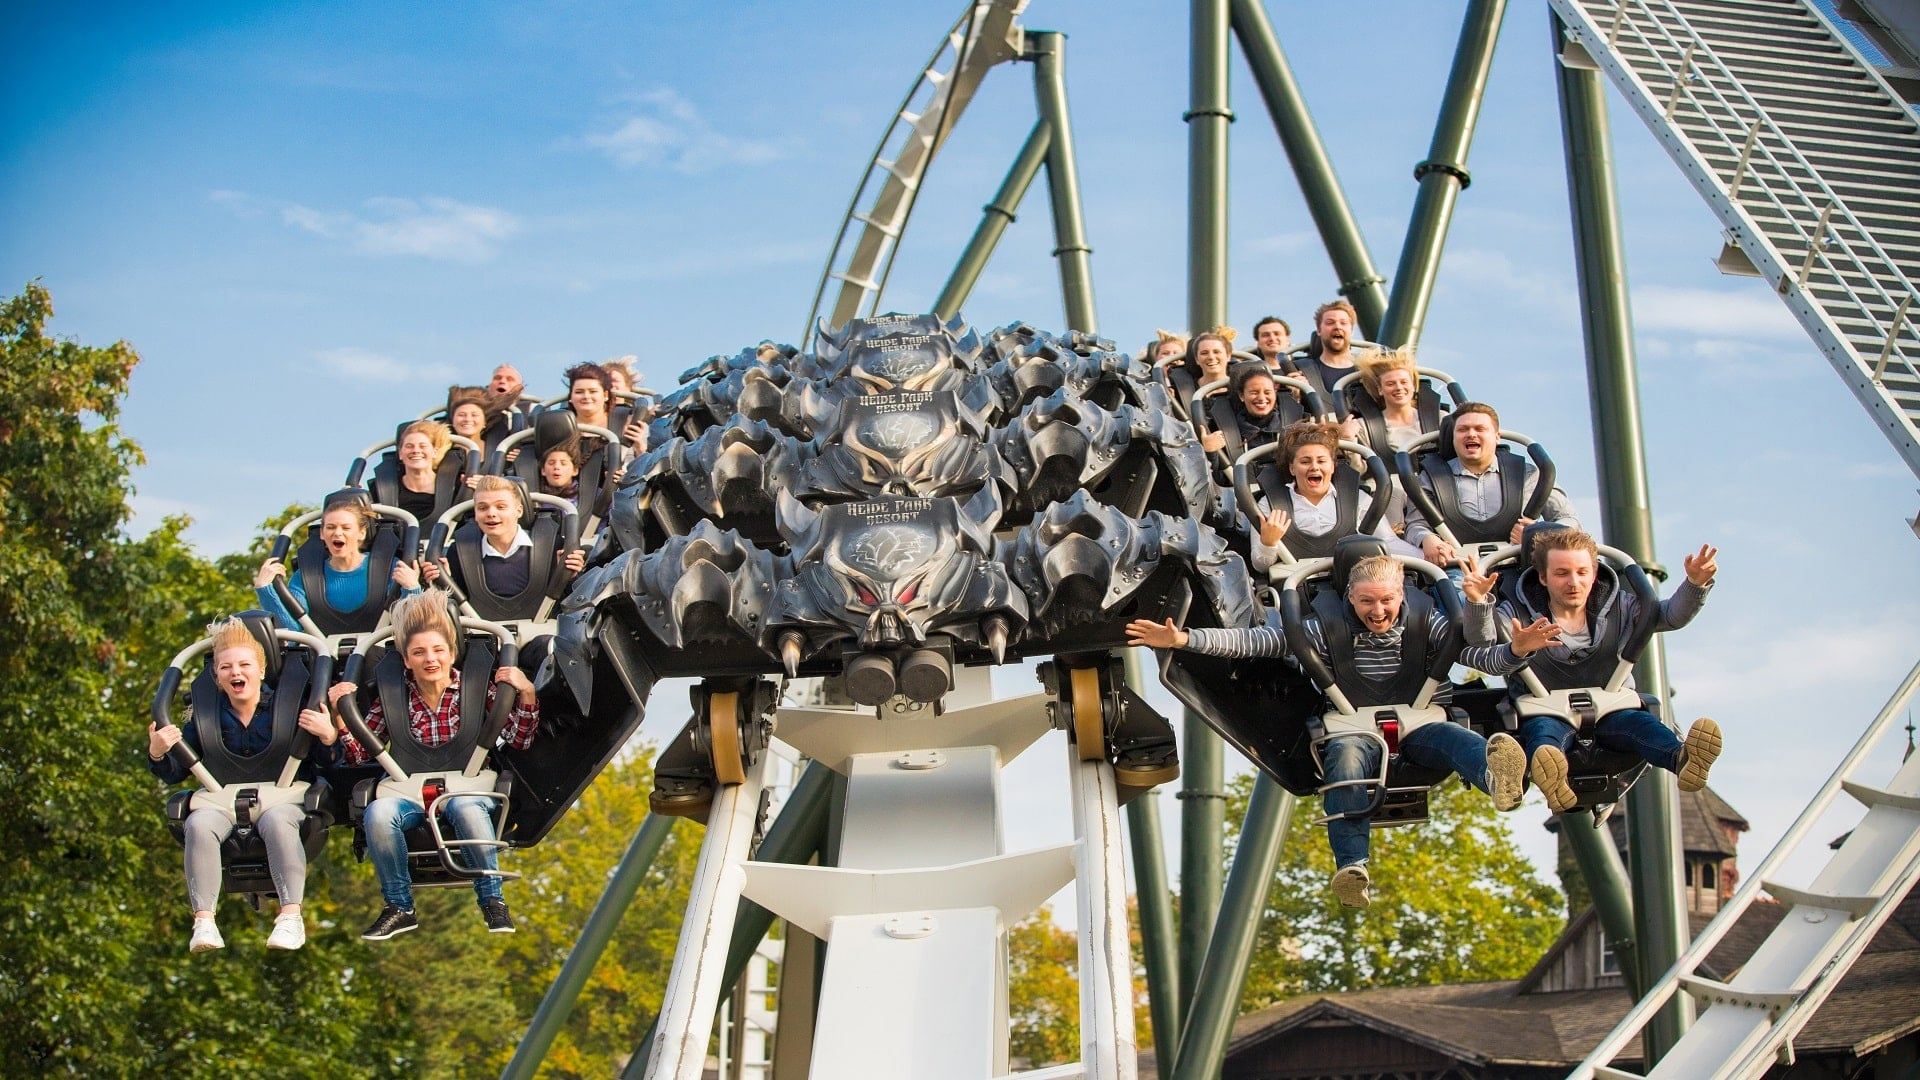 heide-park-resort-flug-der-d-monen